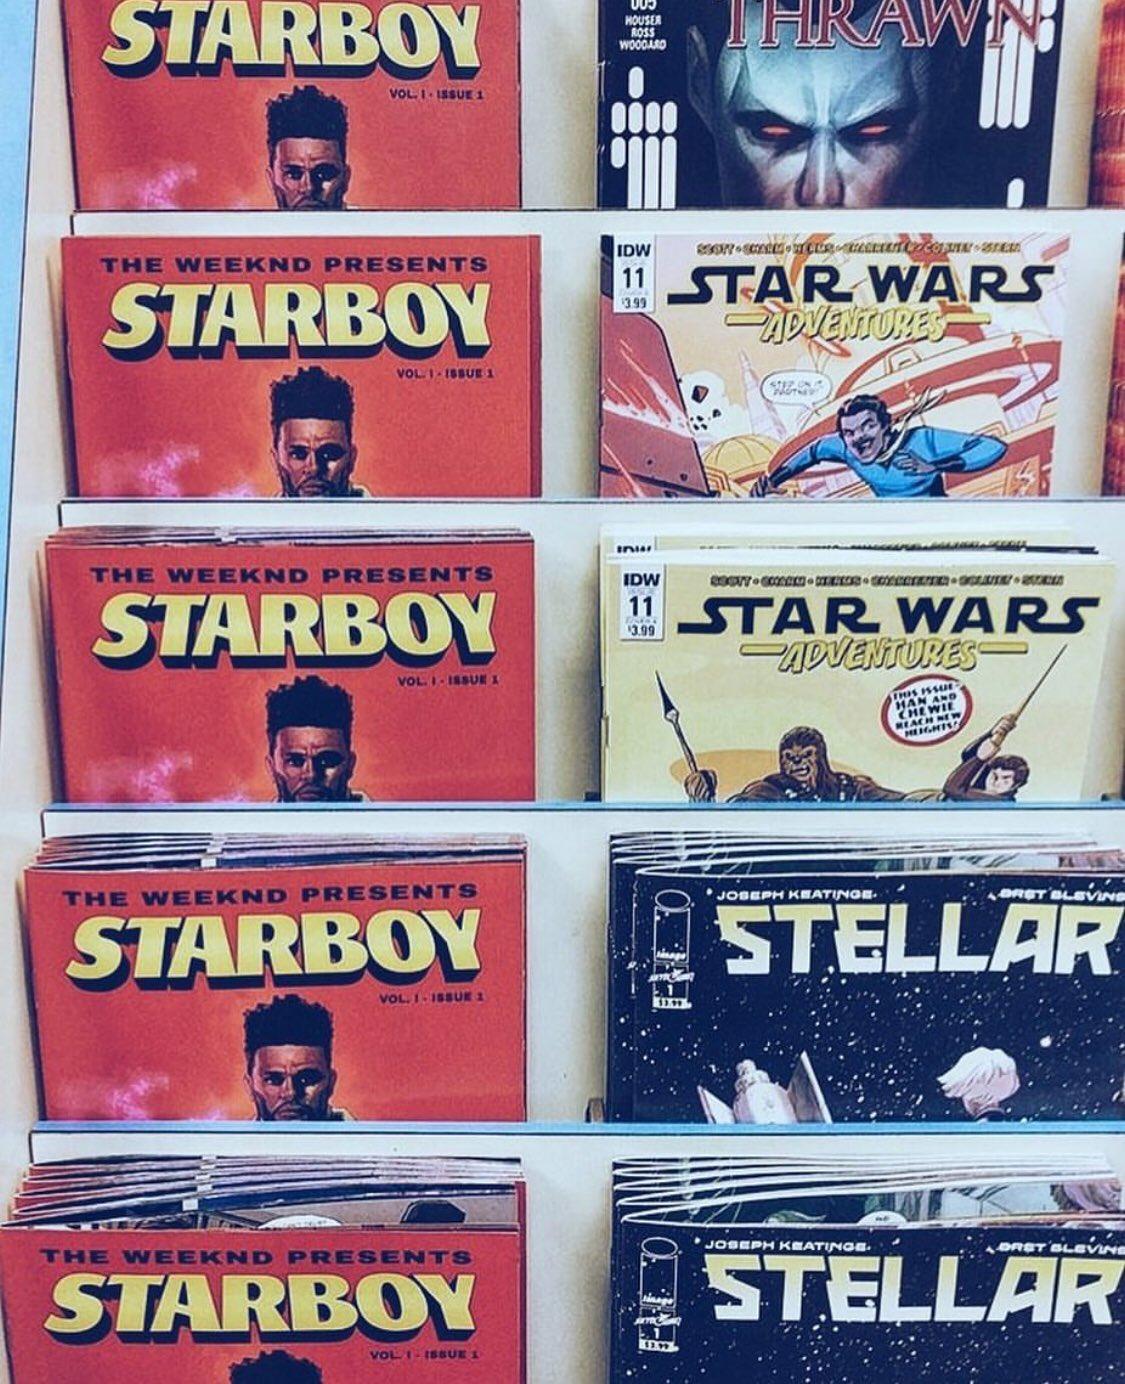 STARBOY ON COMIC STANDS @Marvel https://t.co/0JJedzOJAr